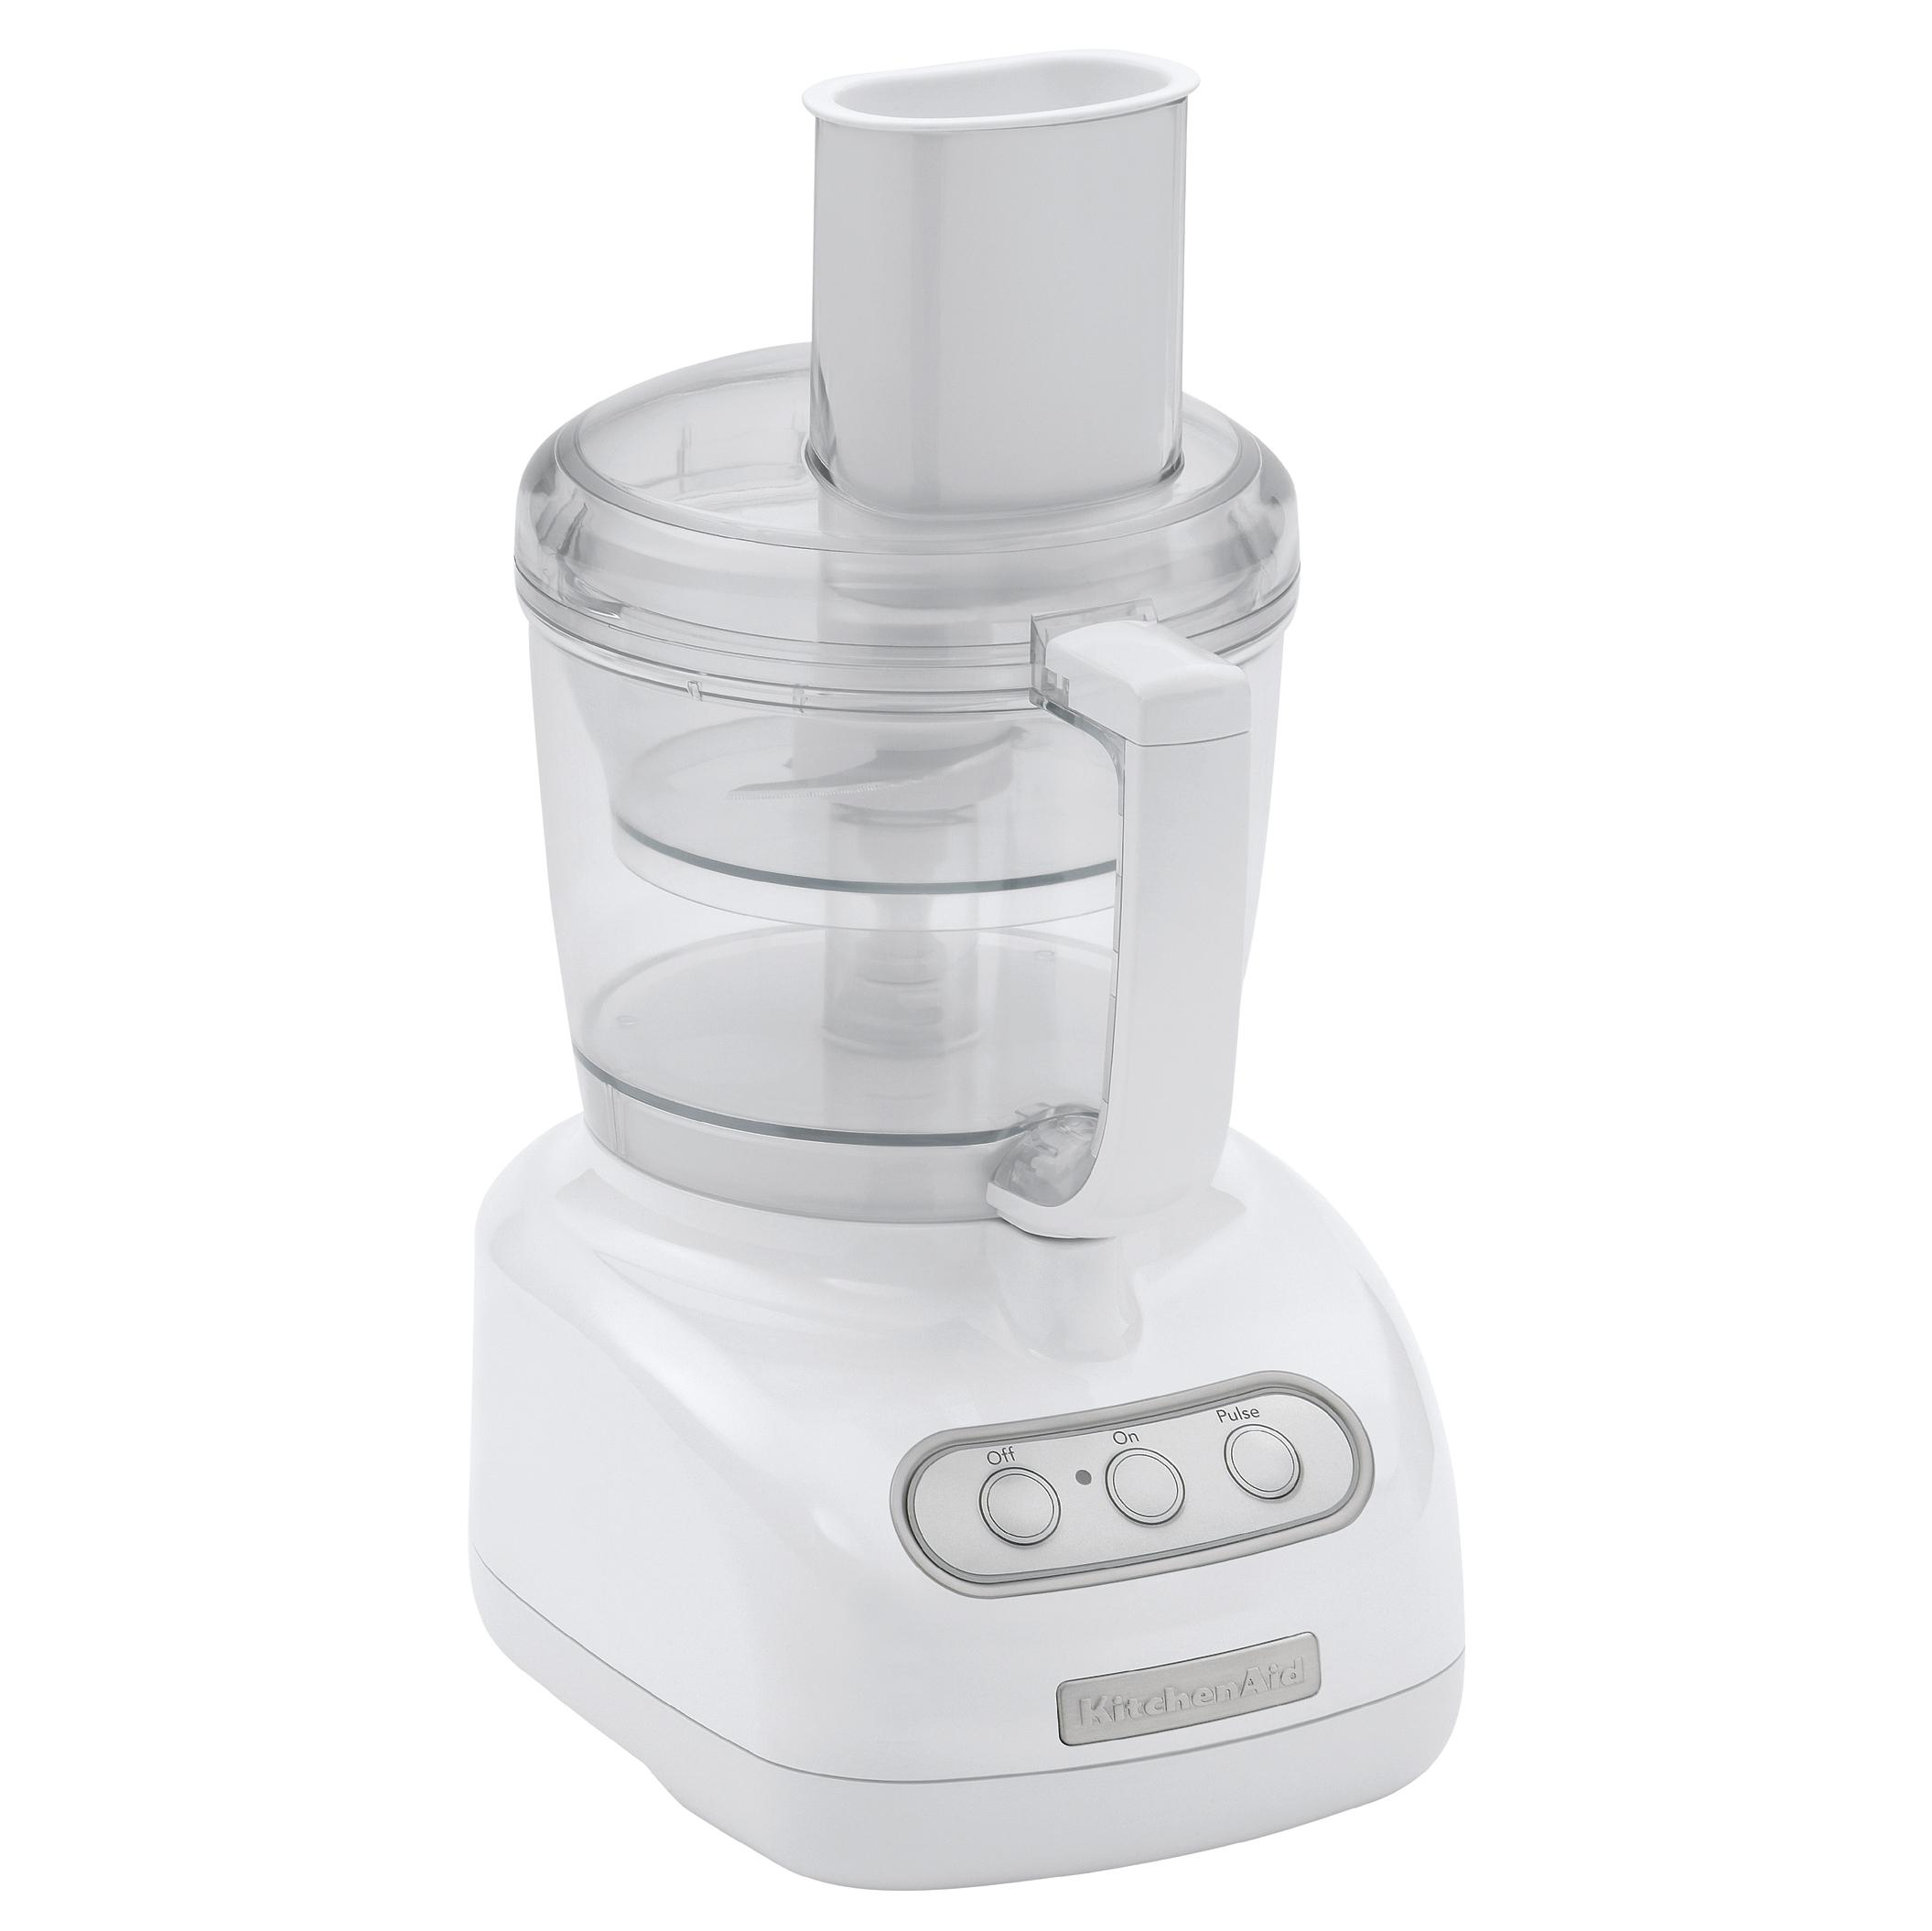 Amazon Com Kitchenaid Kfp720ob 7 Cup Food Processor With